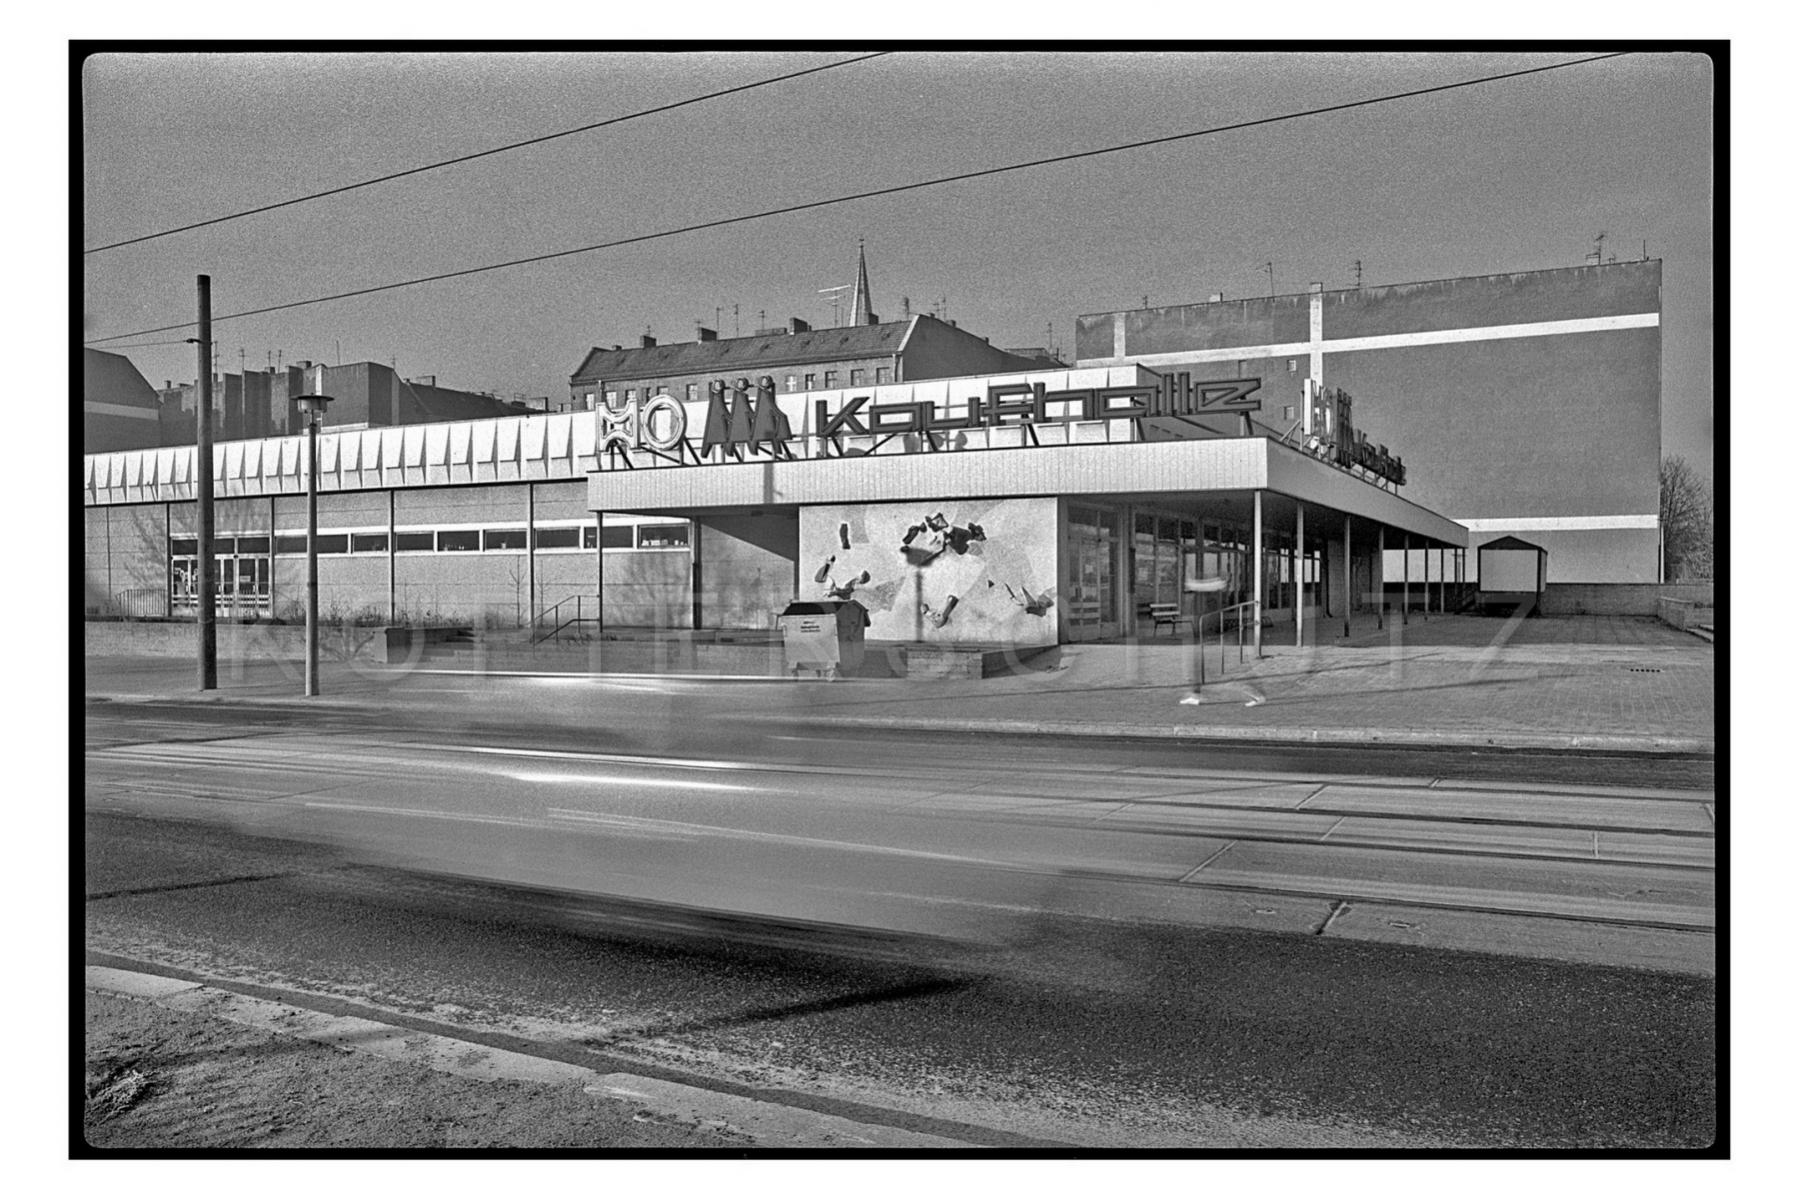 Nr02-096_Stahlheimerstraße -1989